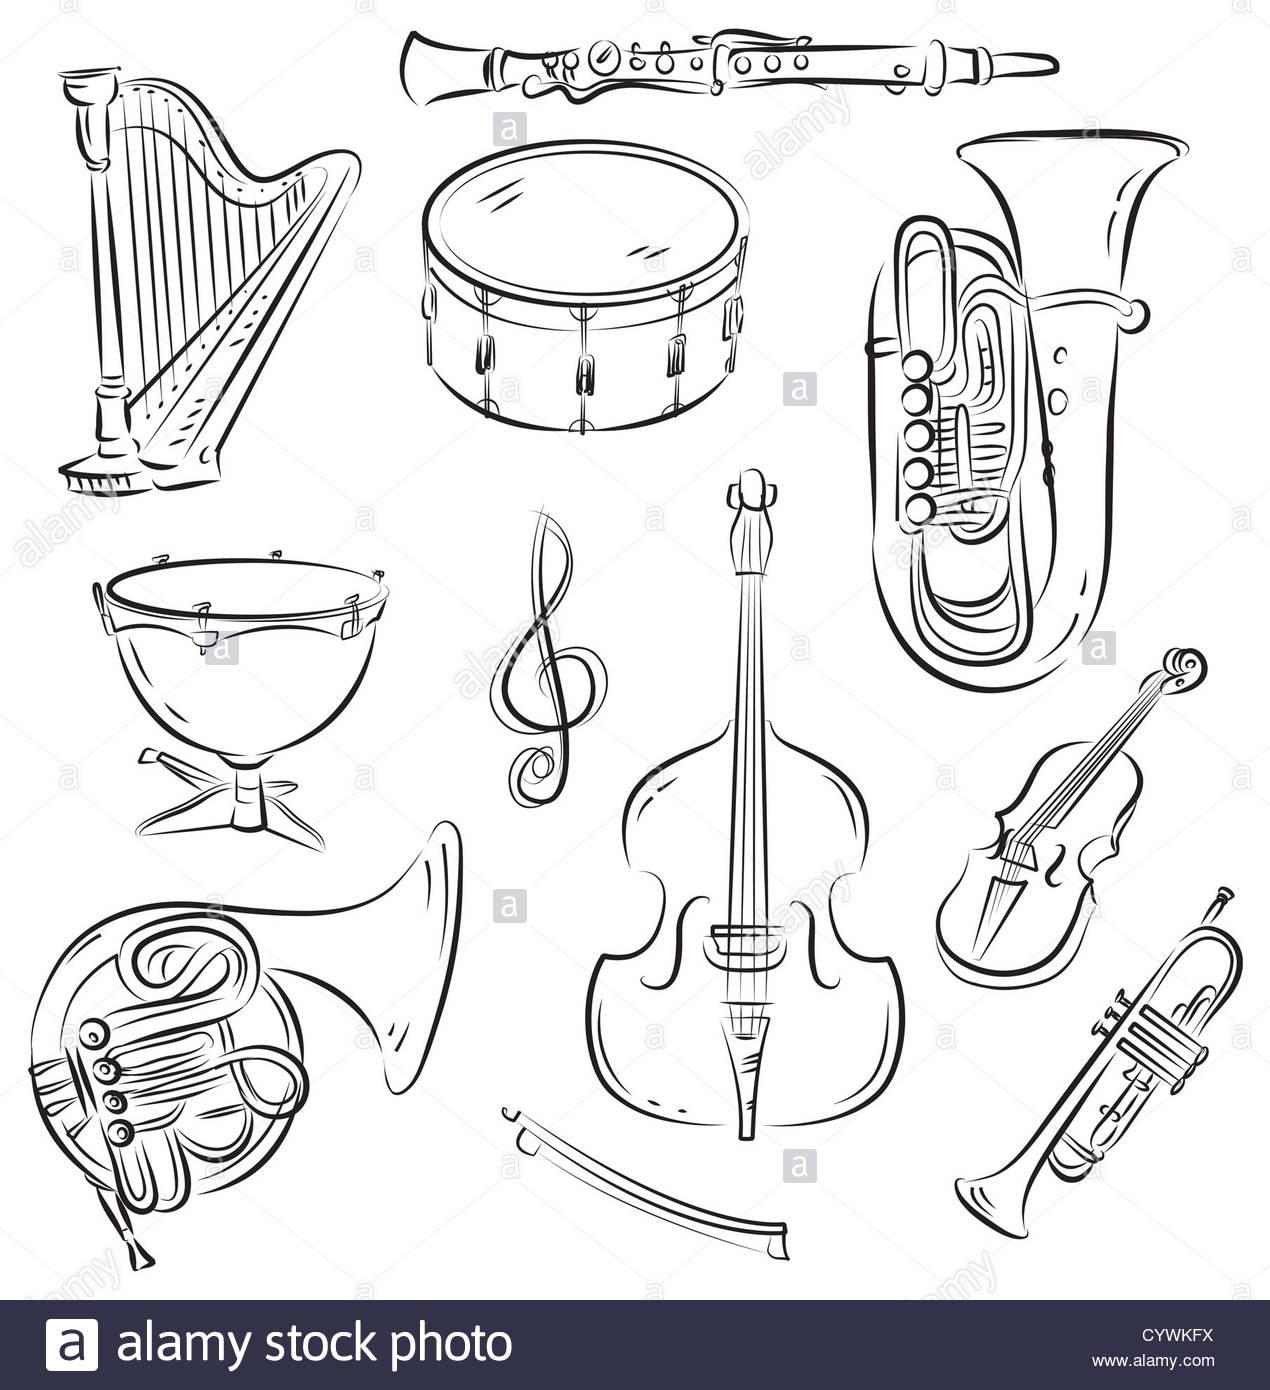 Jeu De Croquis Vecteur D'instruments De Musique De L serapportantà Jeu D Instruments